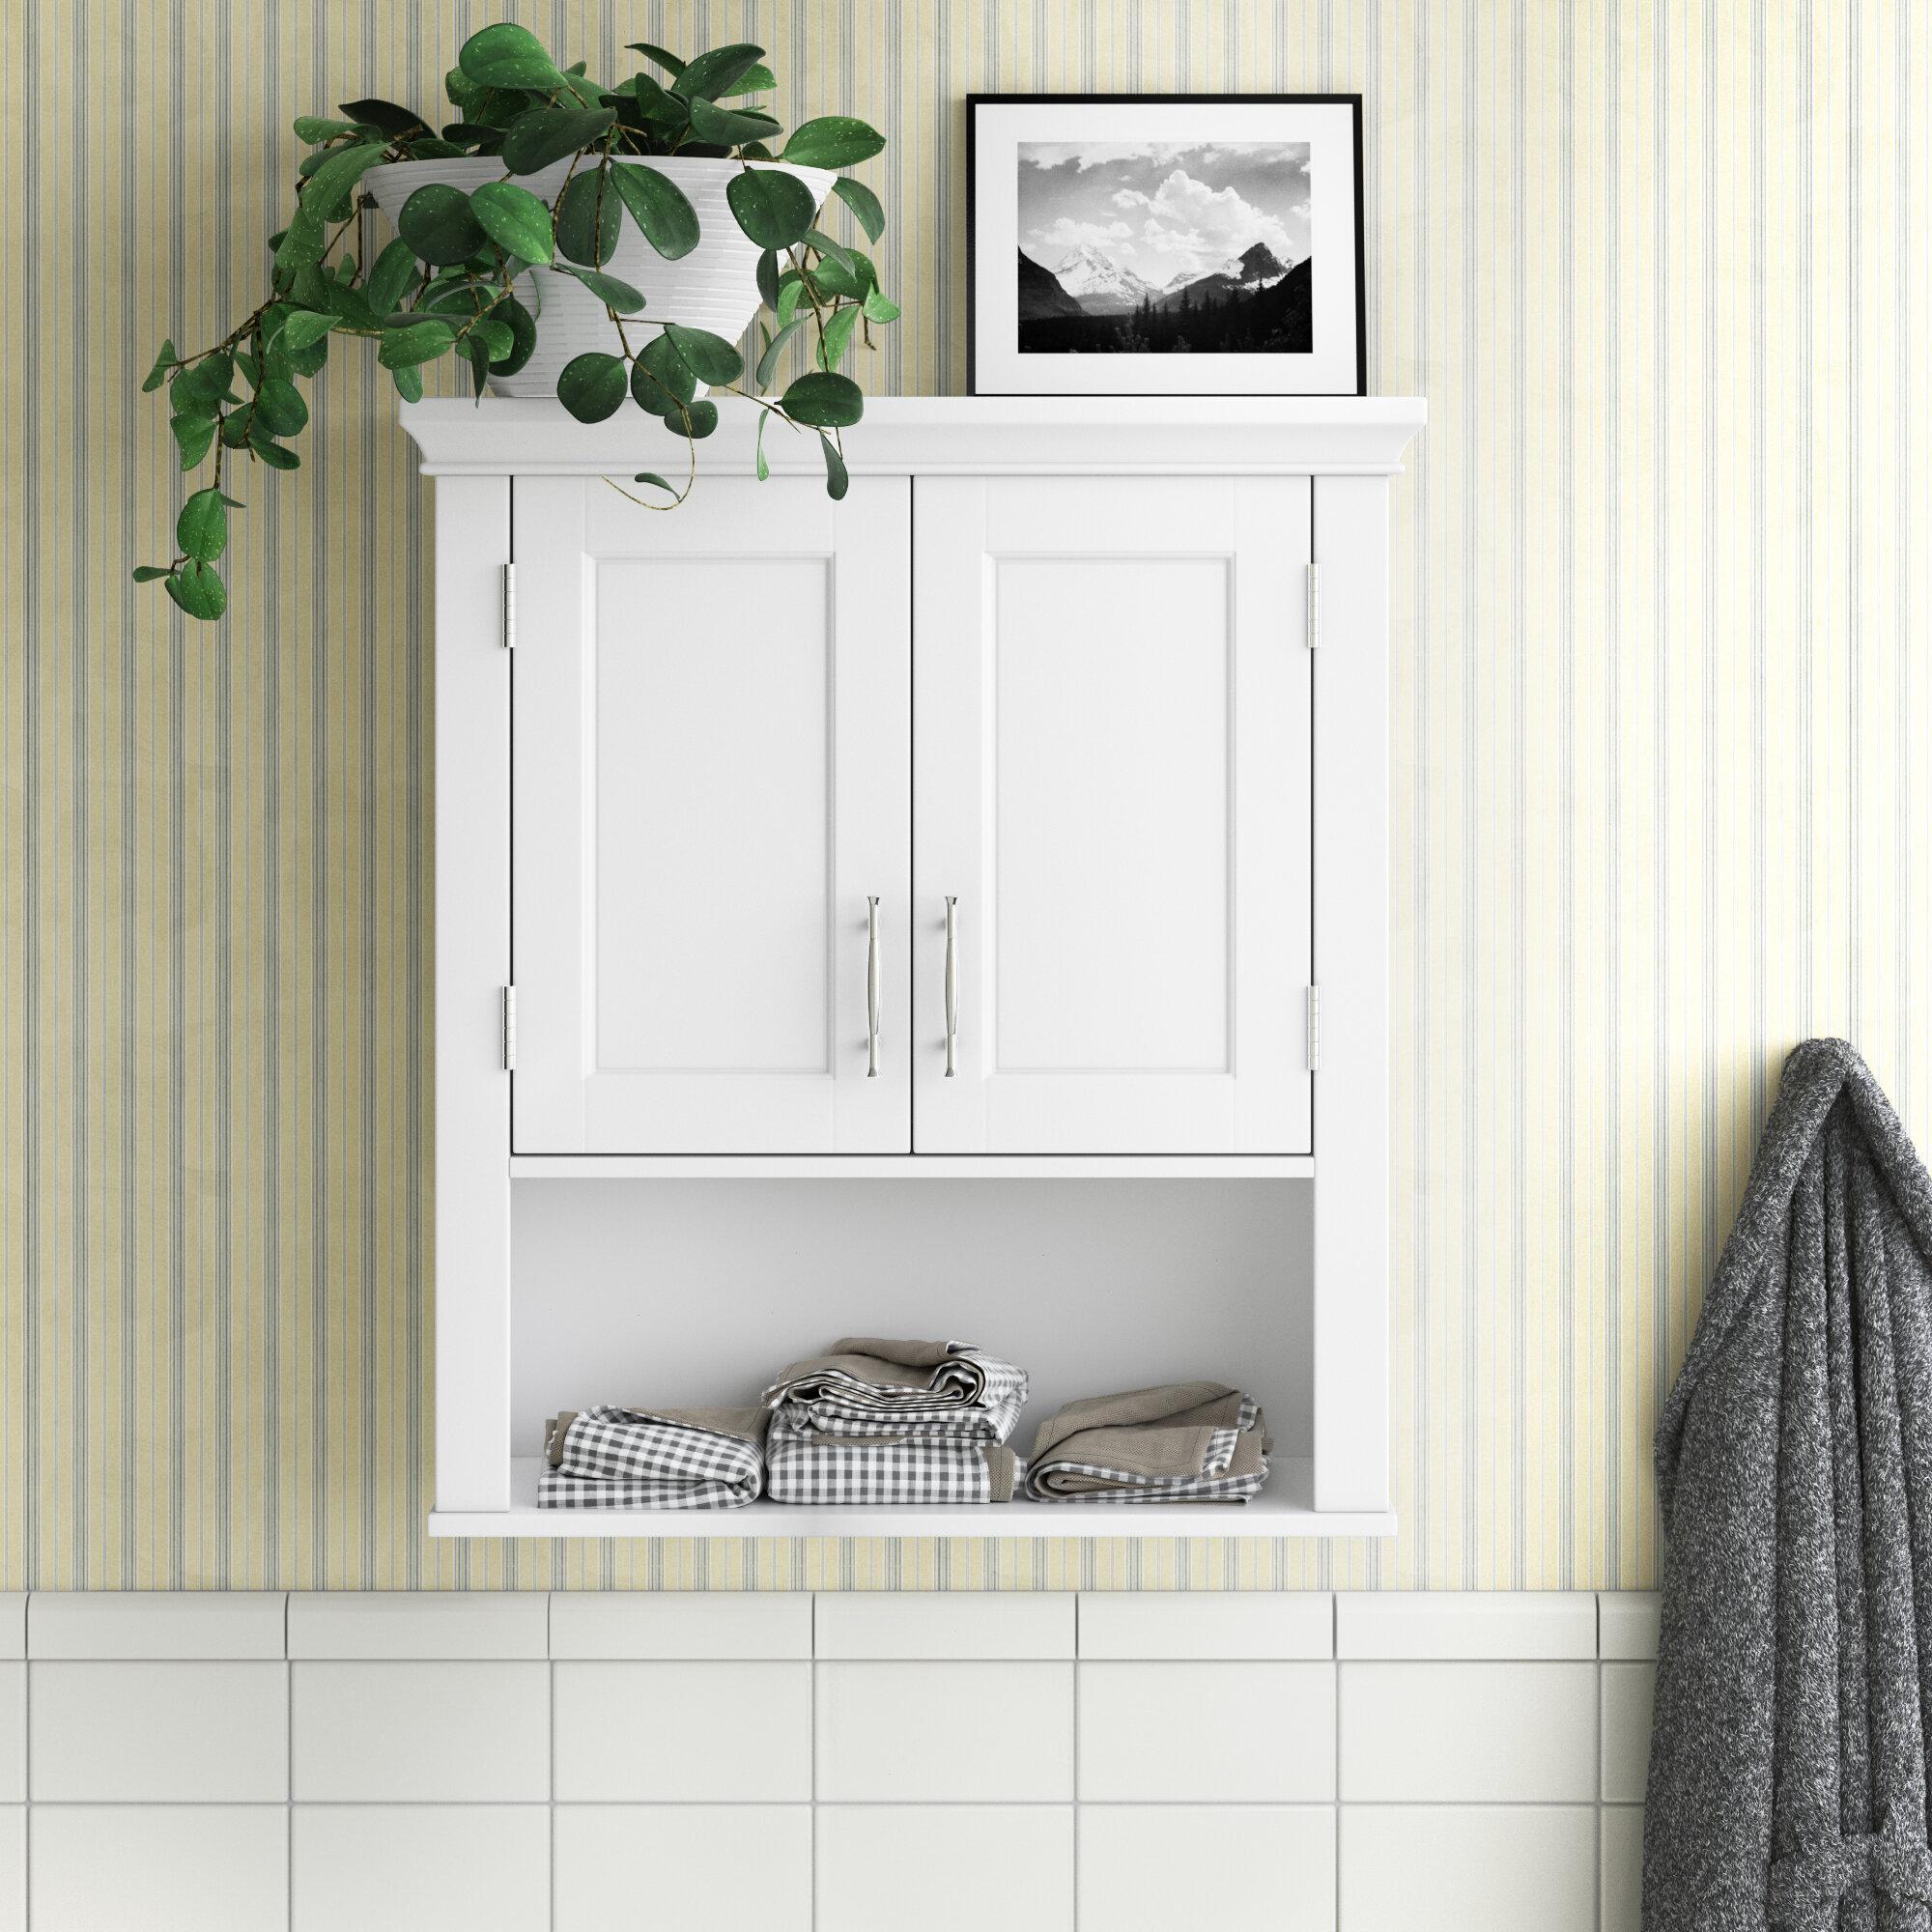 Bathroom Cabinets Shelving You Ll Love In 2021 Wayfair